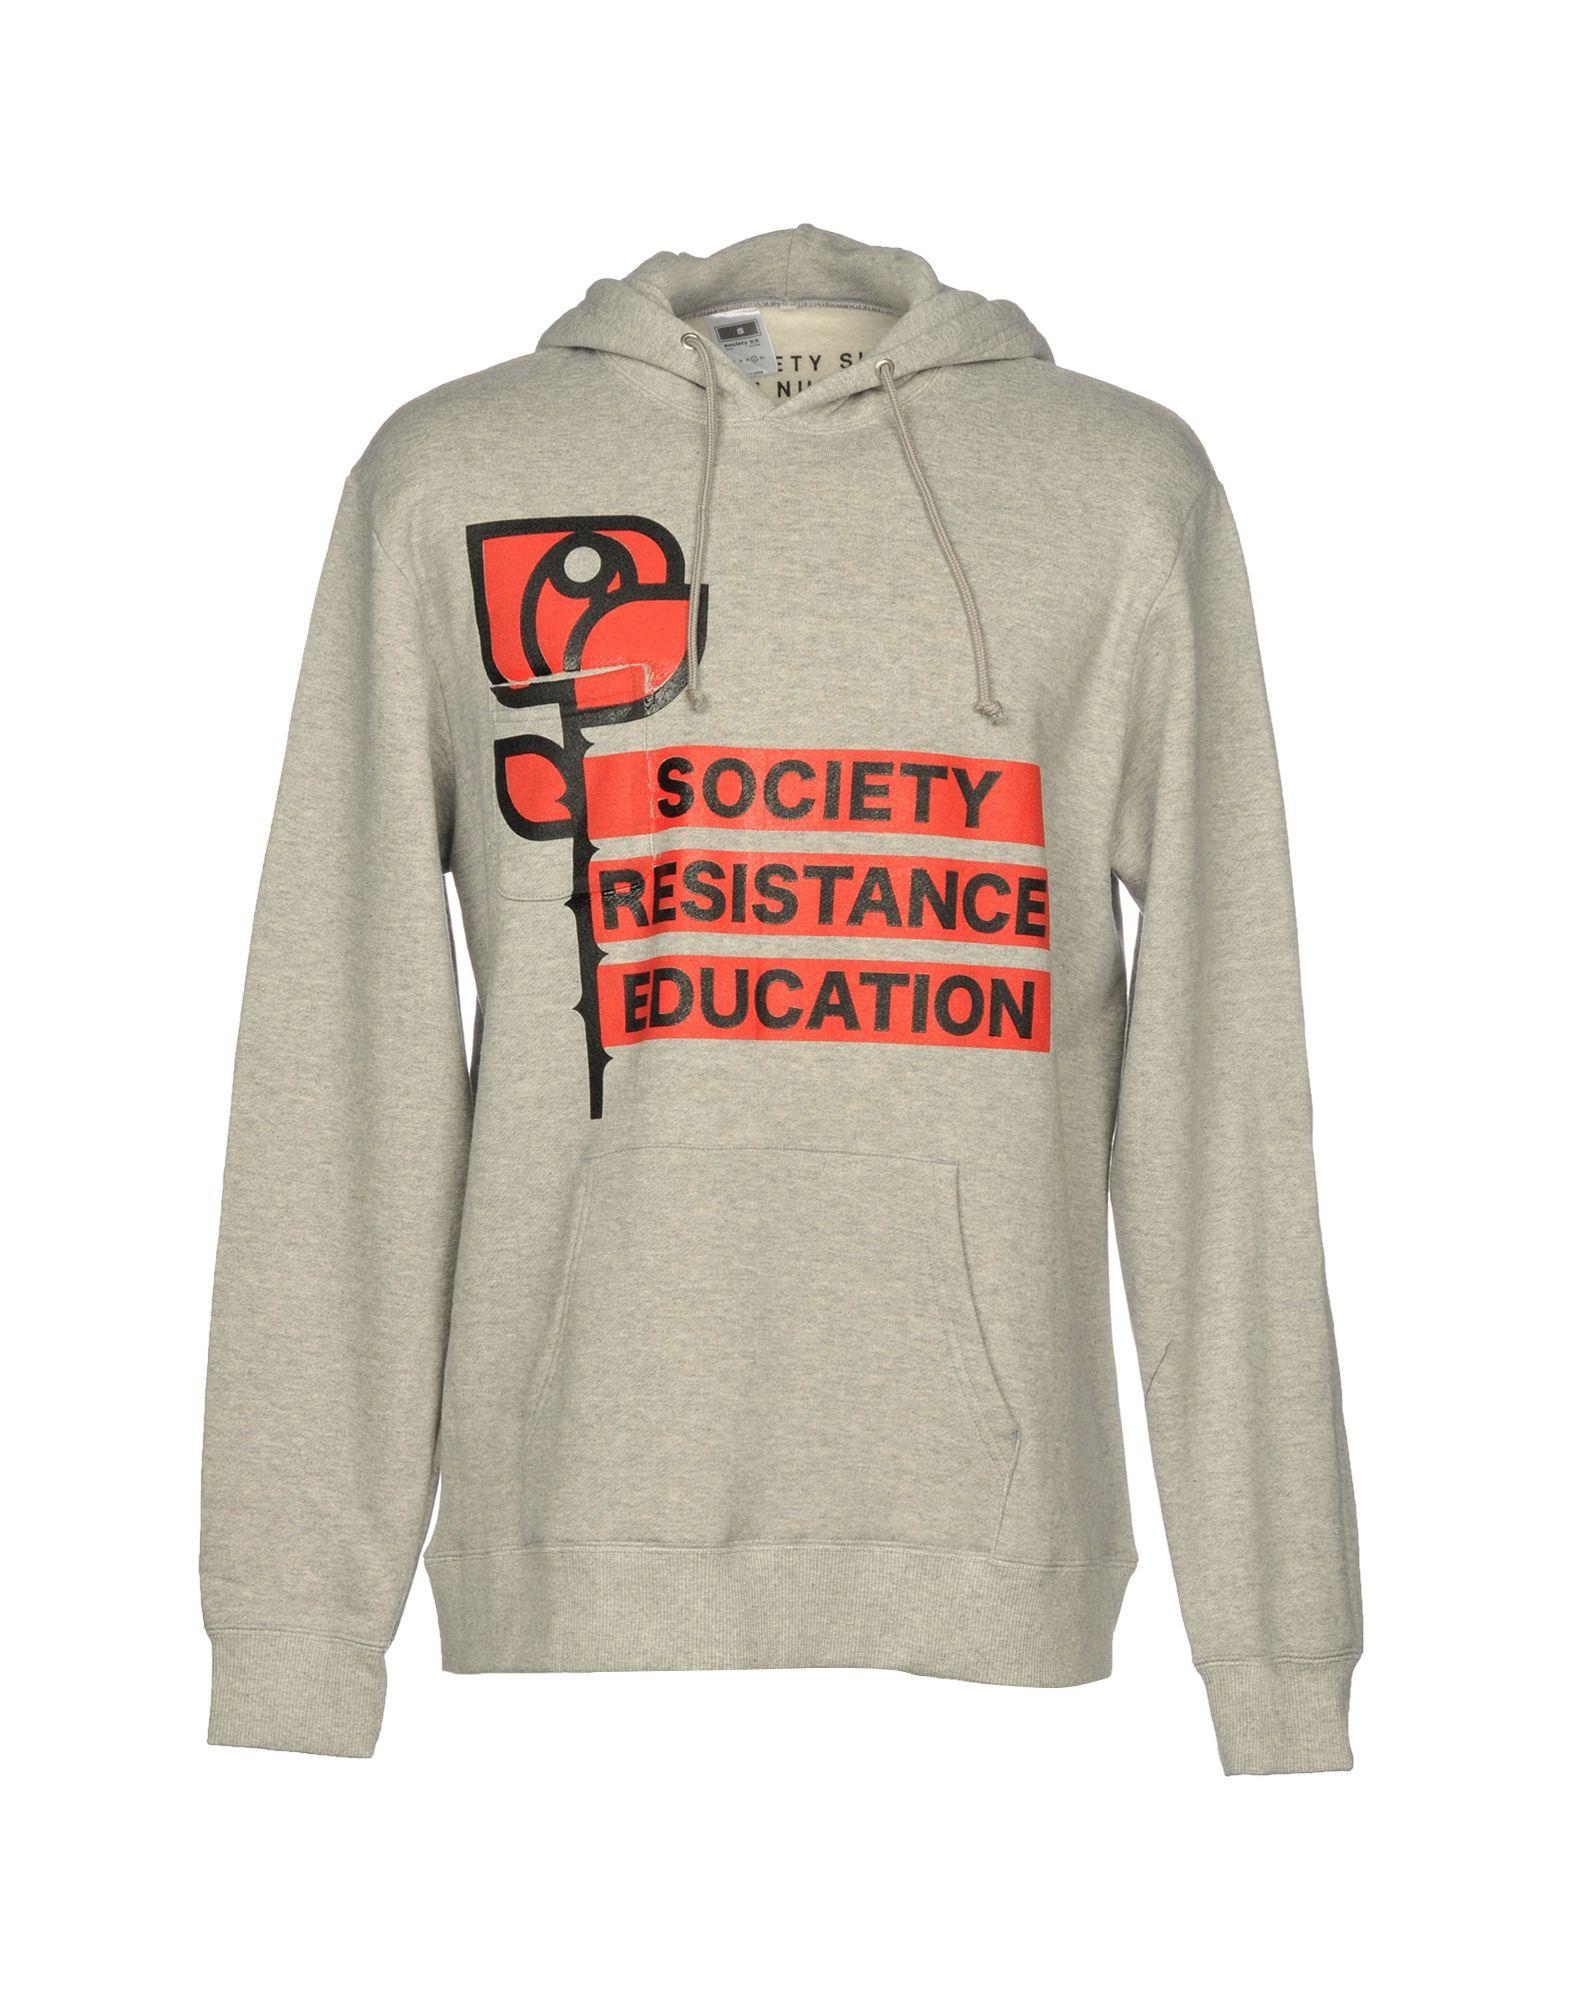 SOCIETY Hooded Sweatshirt in Light Grey